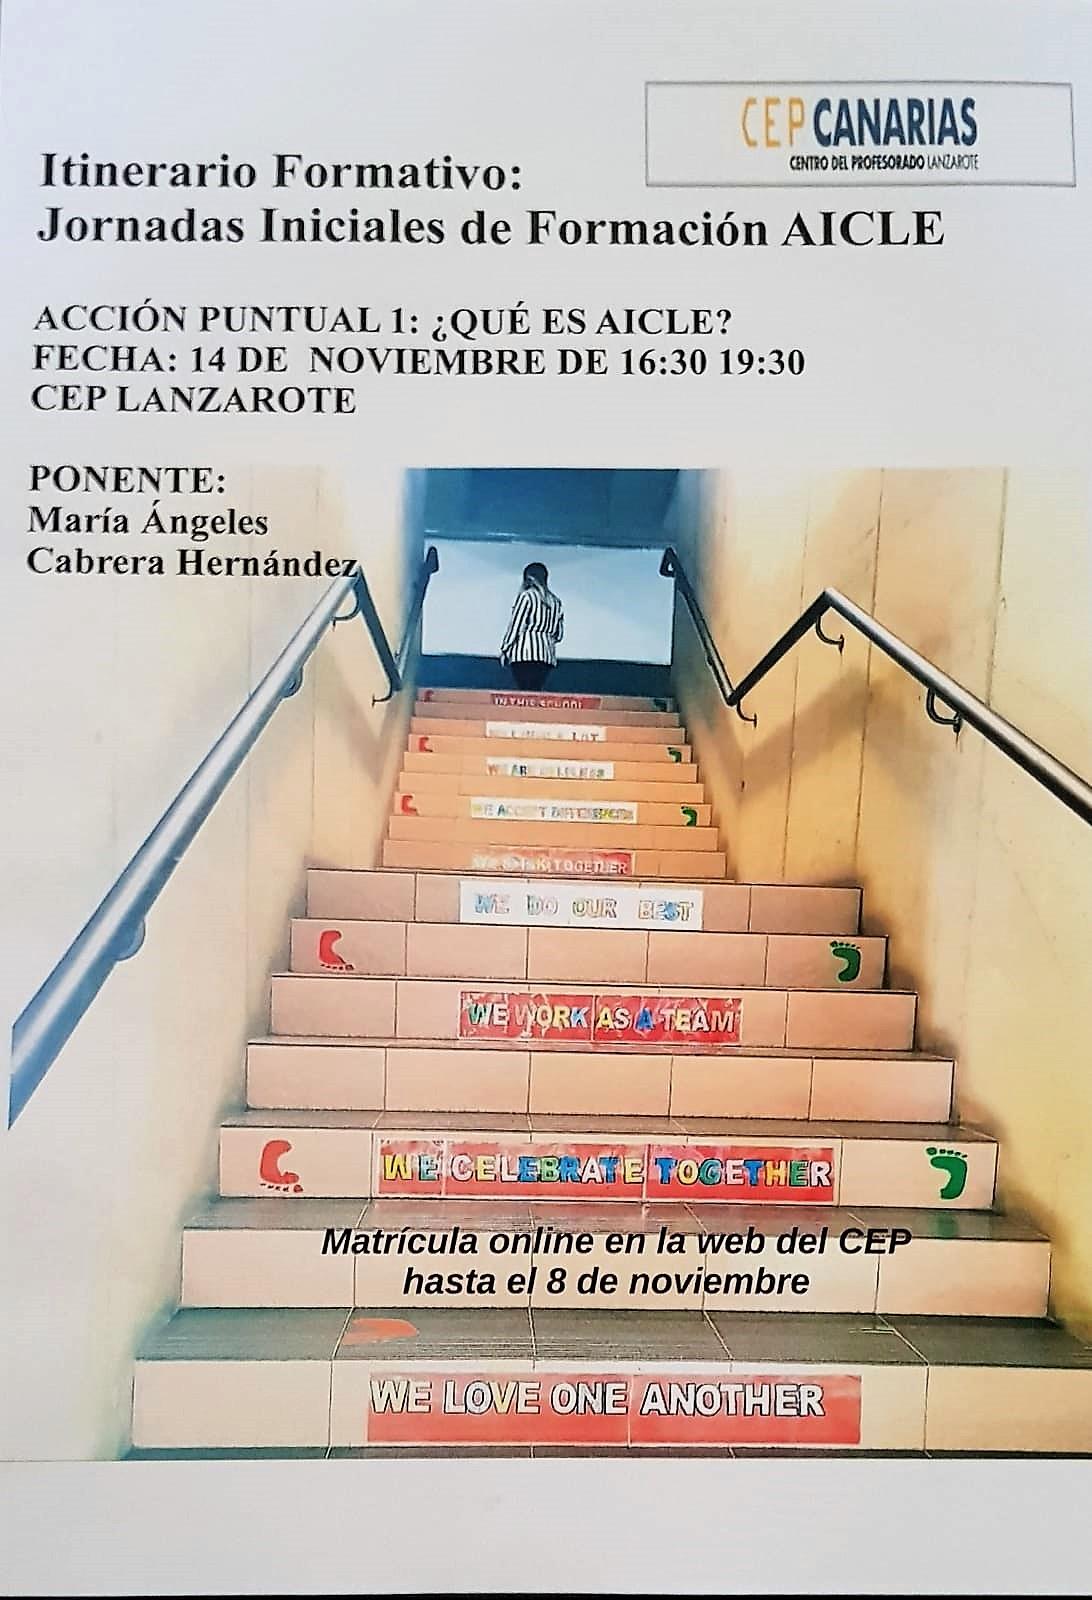 Lenguas Extranjeras Cep Lanzarote 2018